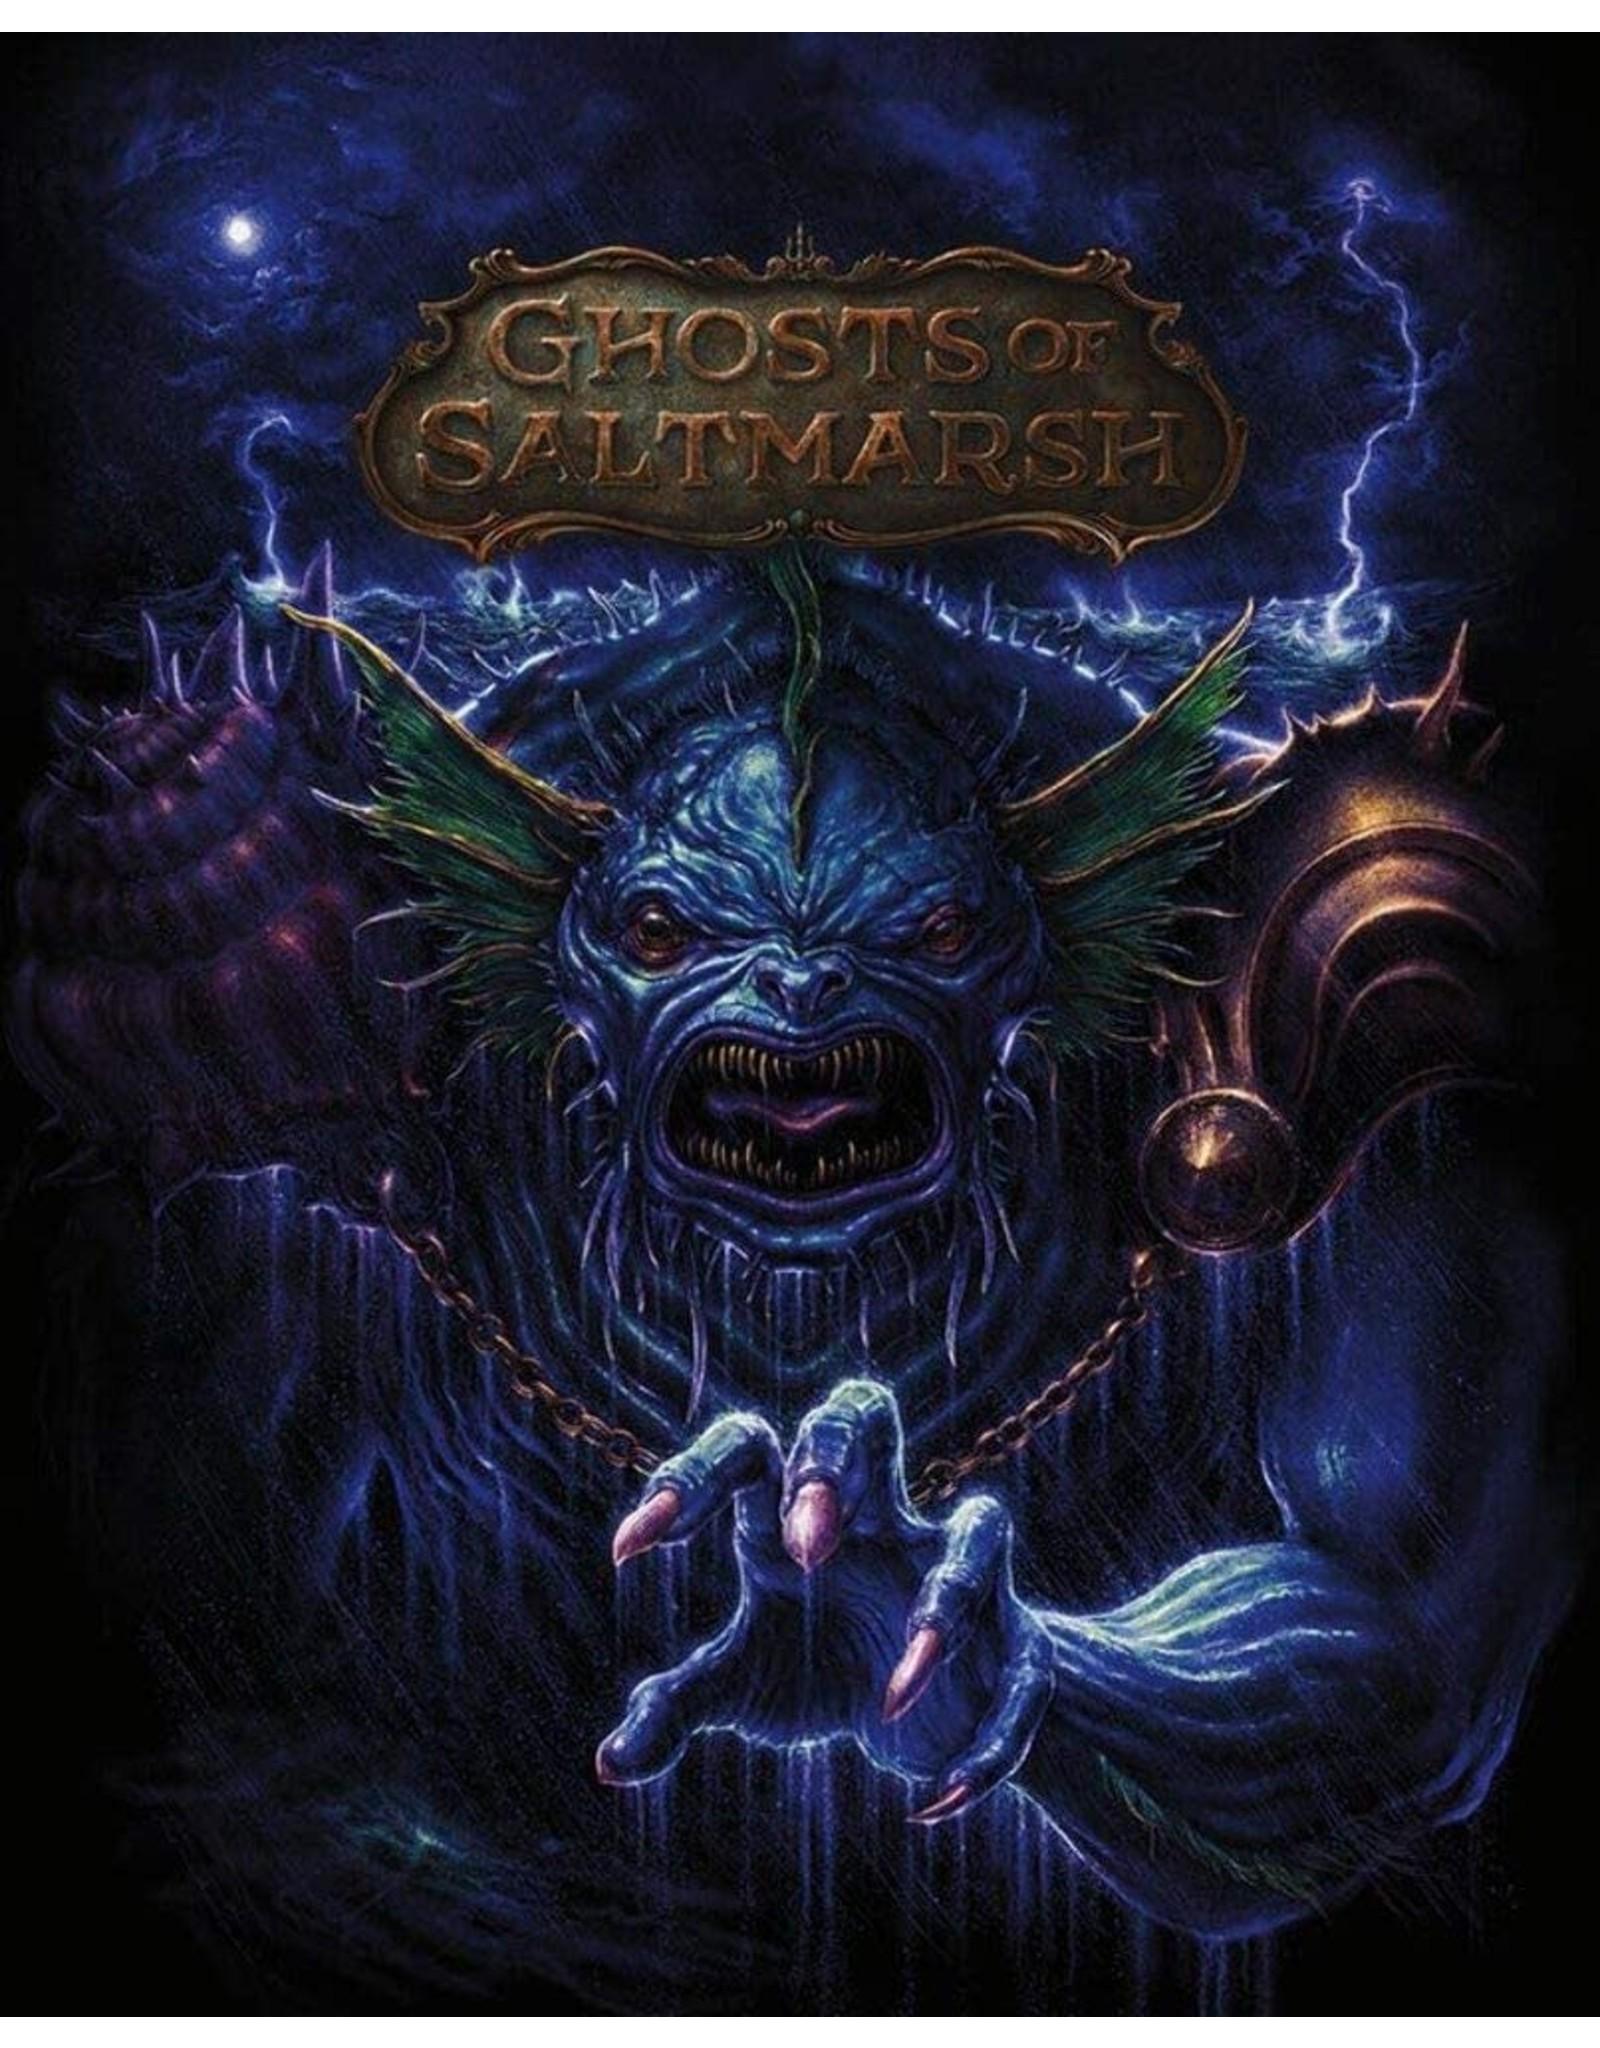 DnD D&D Ghost of the Saltmarsh Limited